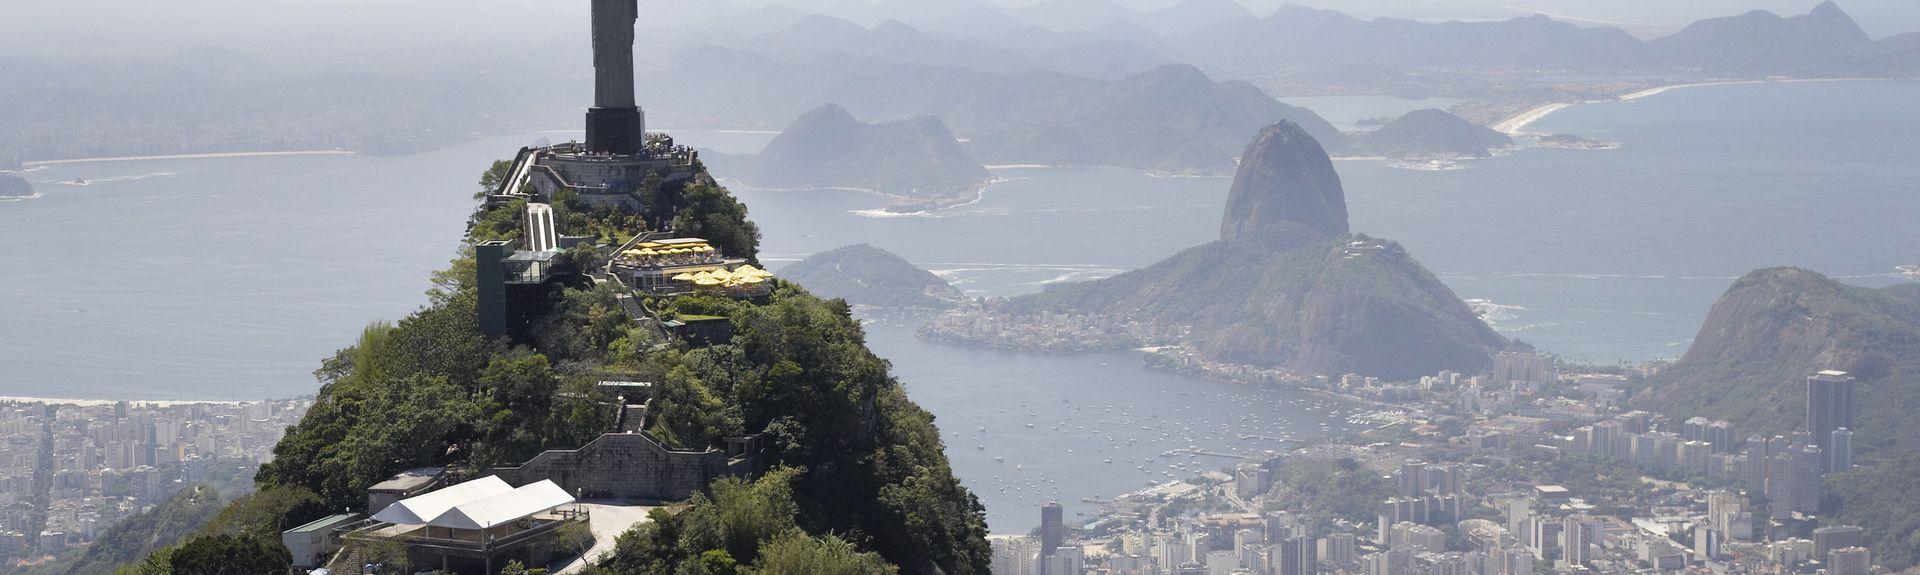 Rio de Janeiro, Region Südosten, Brasilien